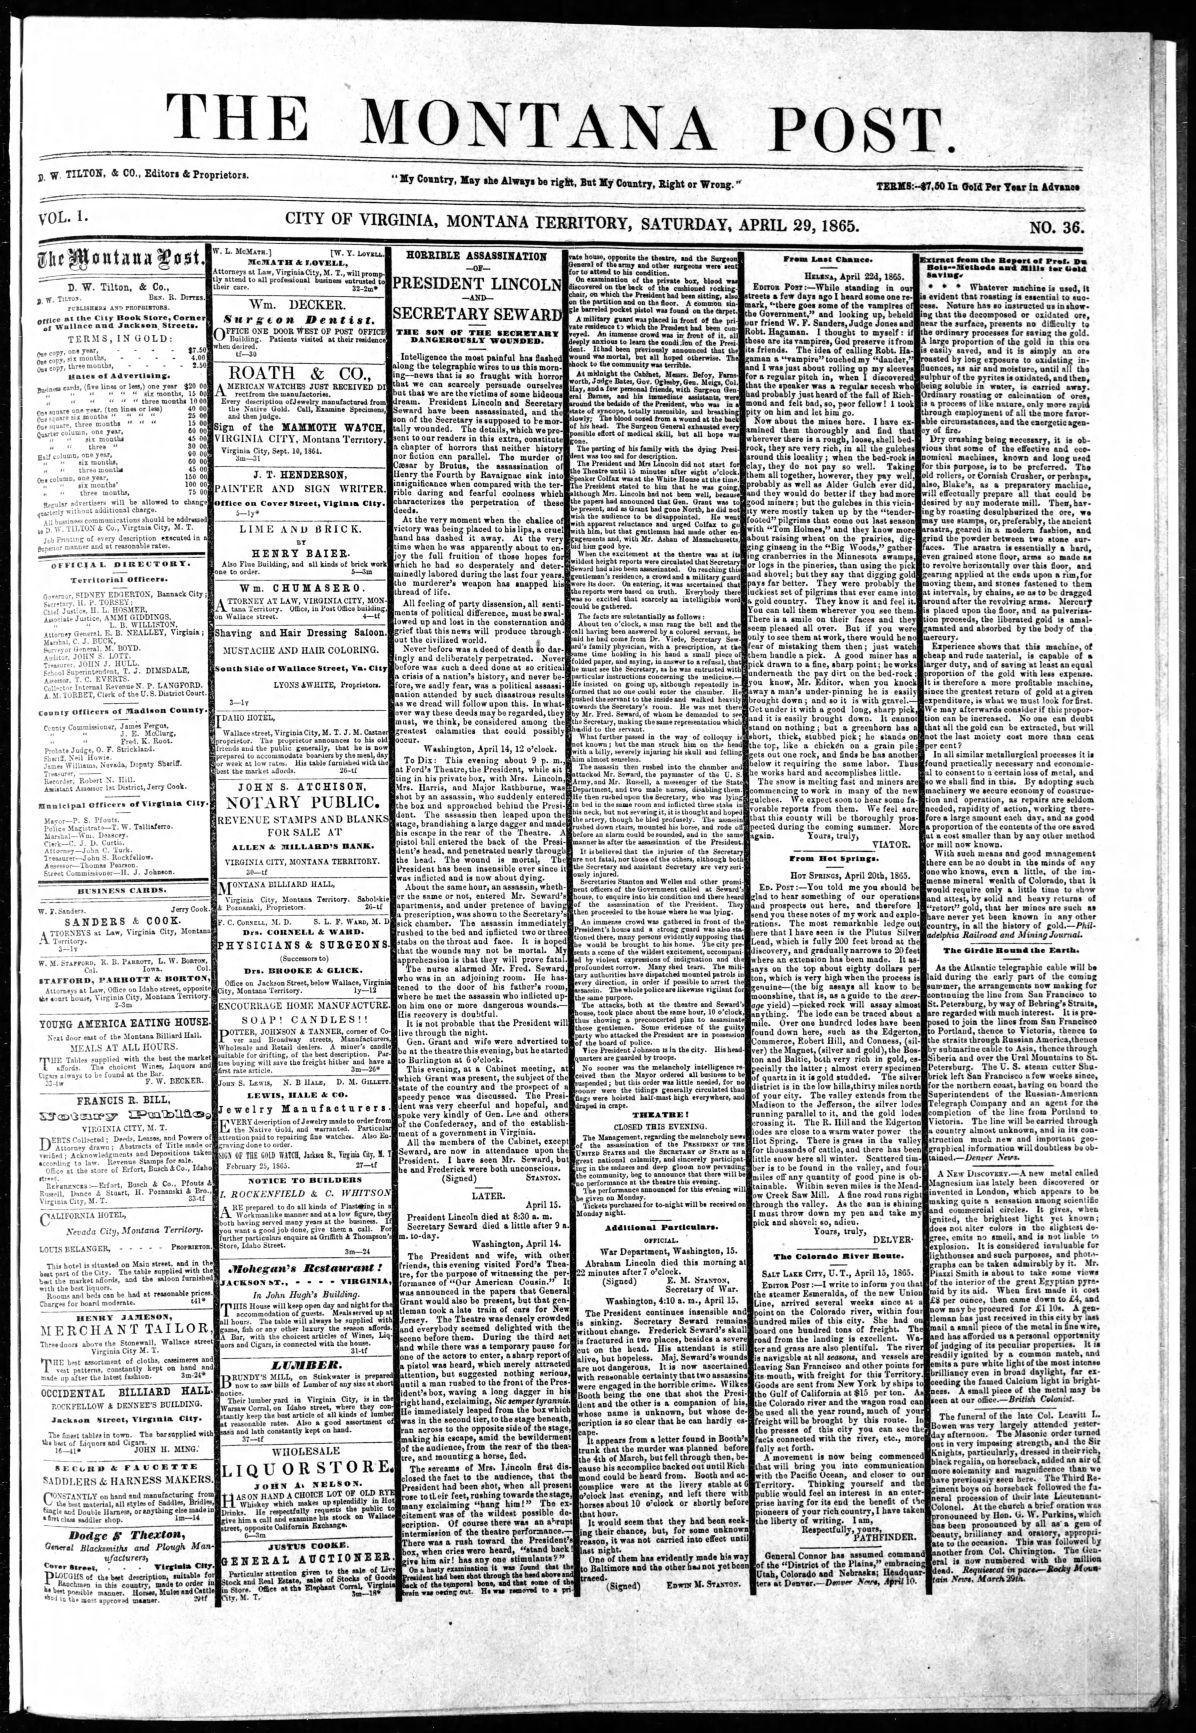 Montana Post, Saturday, April 29, 1865 A1